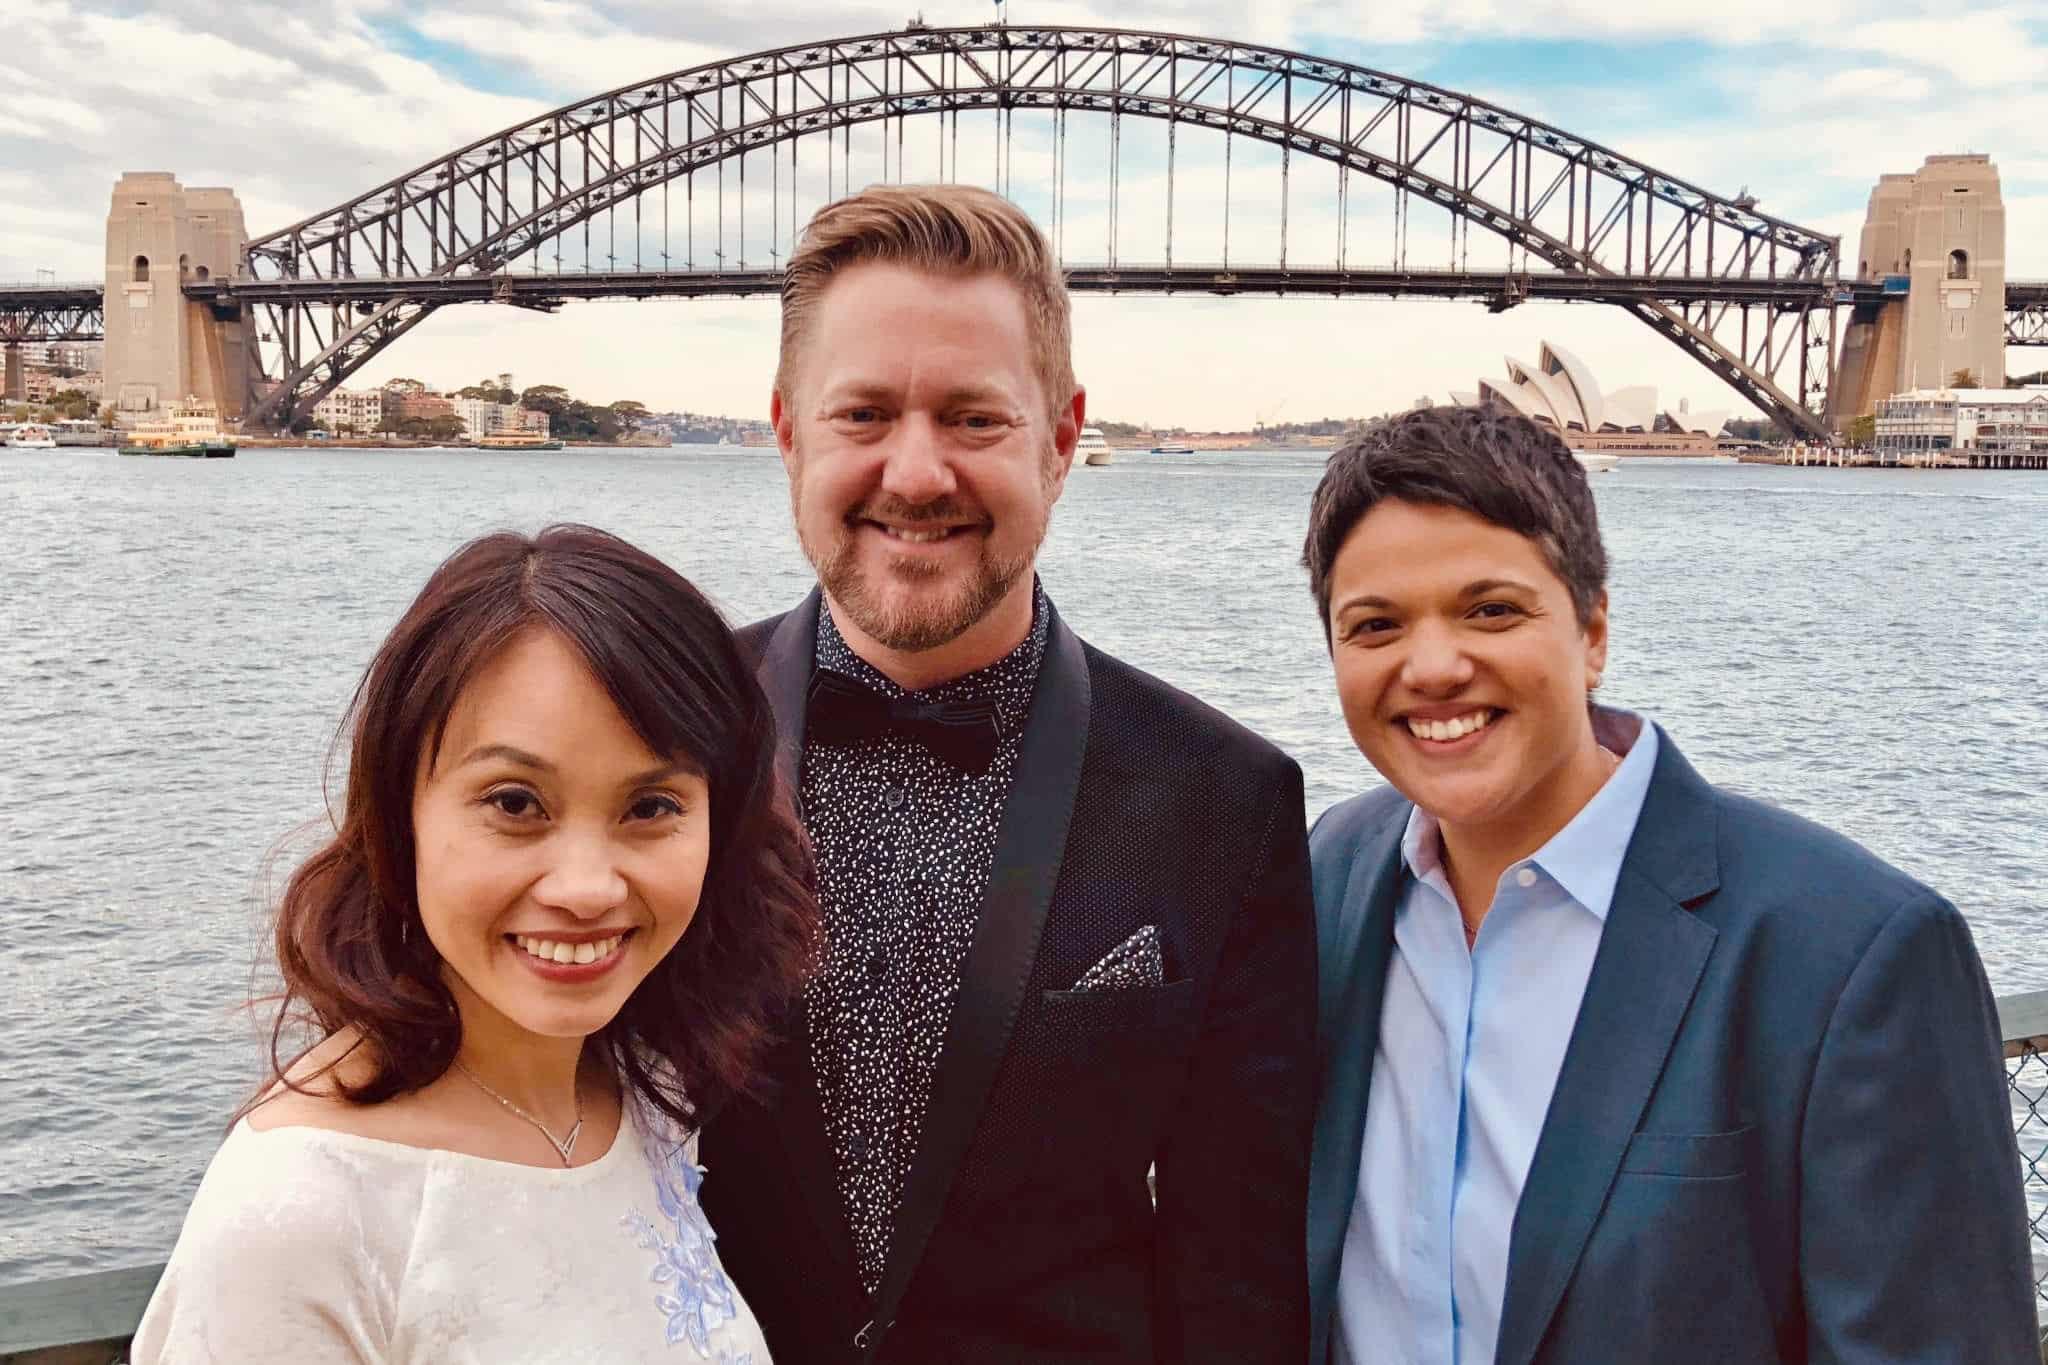 Sharon and Diep Wedding - Sydney Marriage Celebrant Stephen Lee